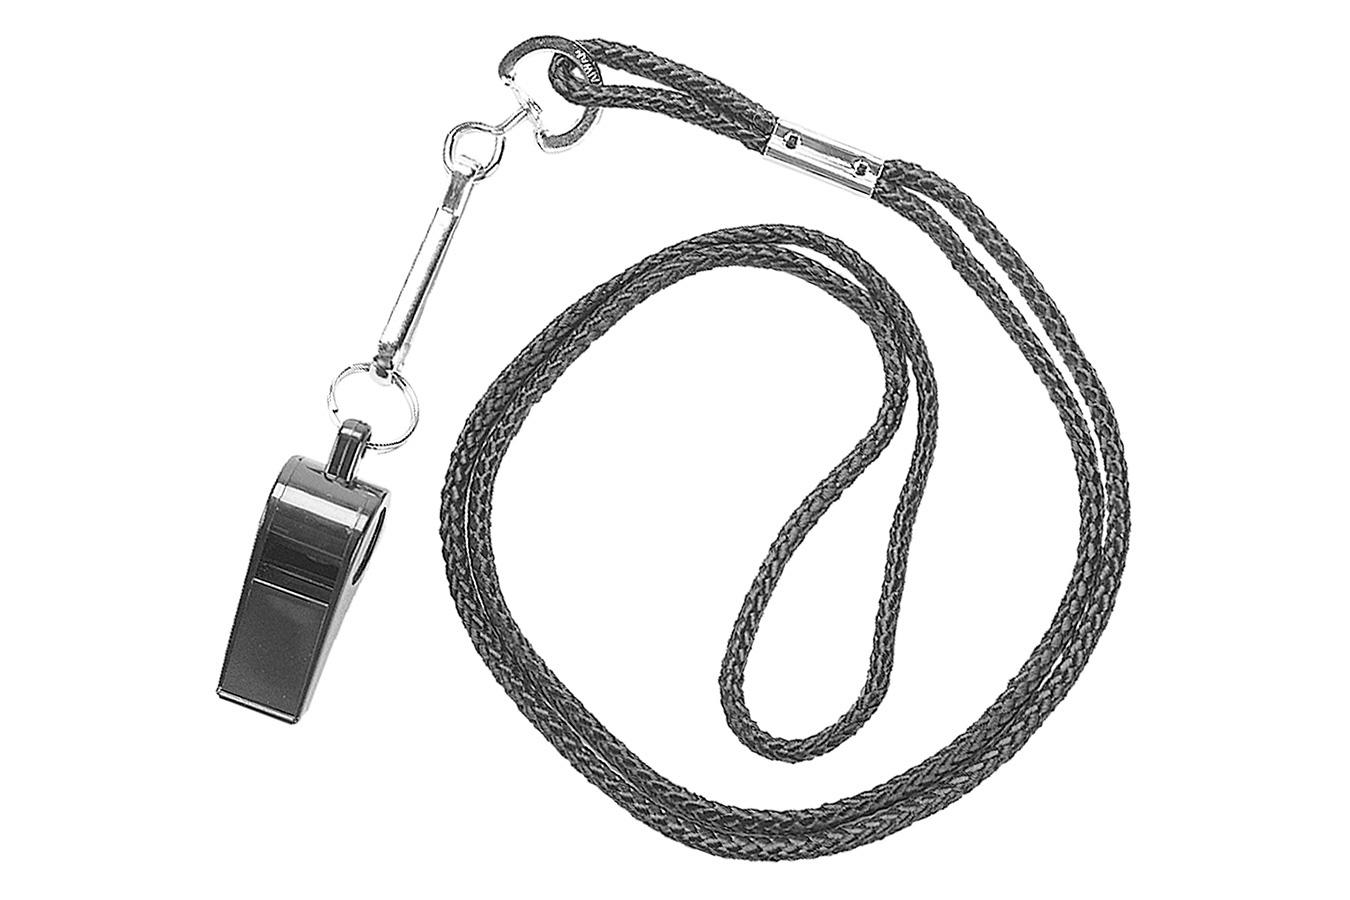 Kwik Goal Whistle/Neck Lanyard Pack